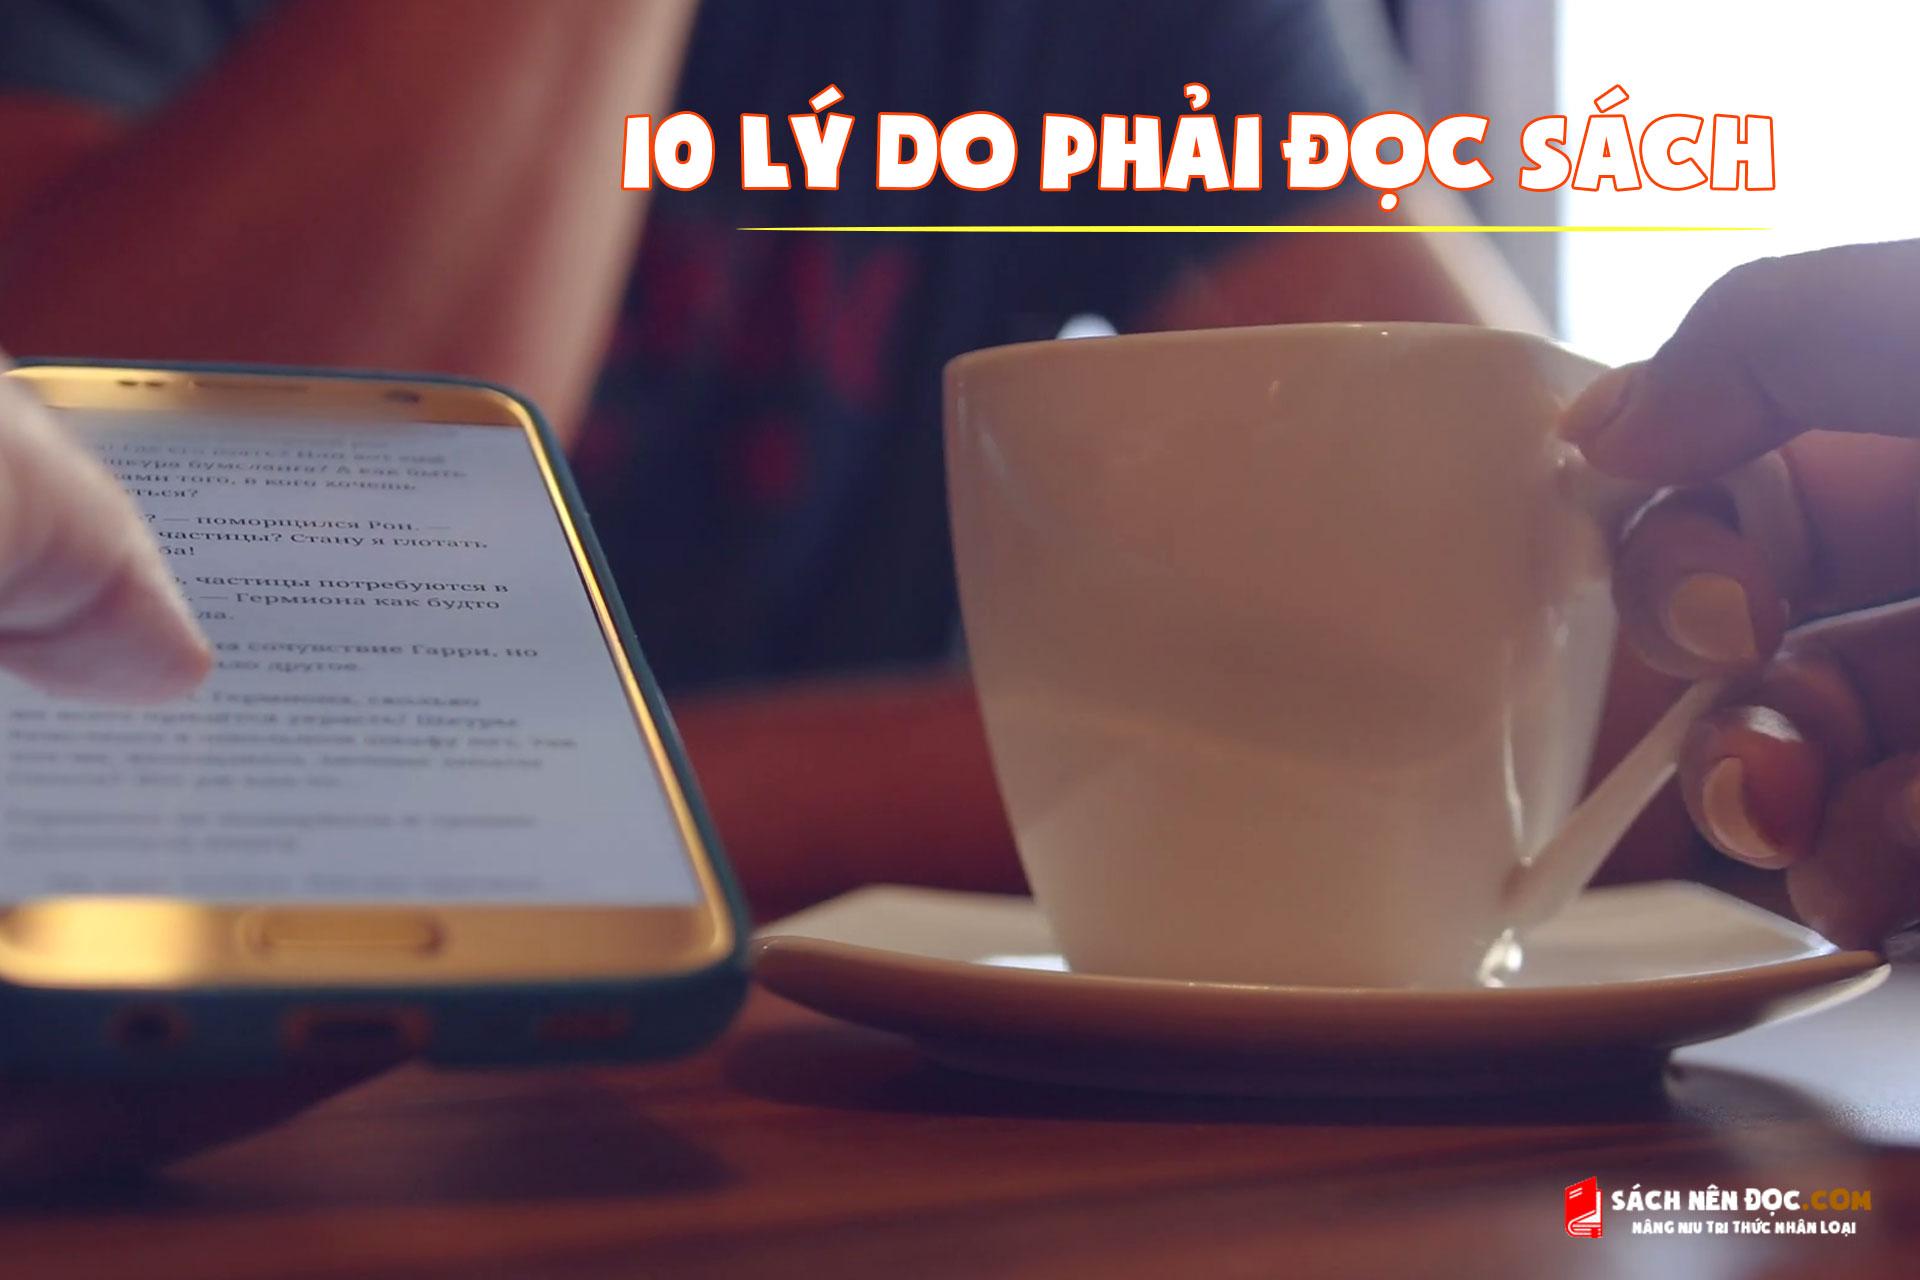 10-ly-do-lam-lanh-dao-phai-nen-doc-sach-sach-nen-doc-0